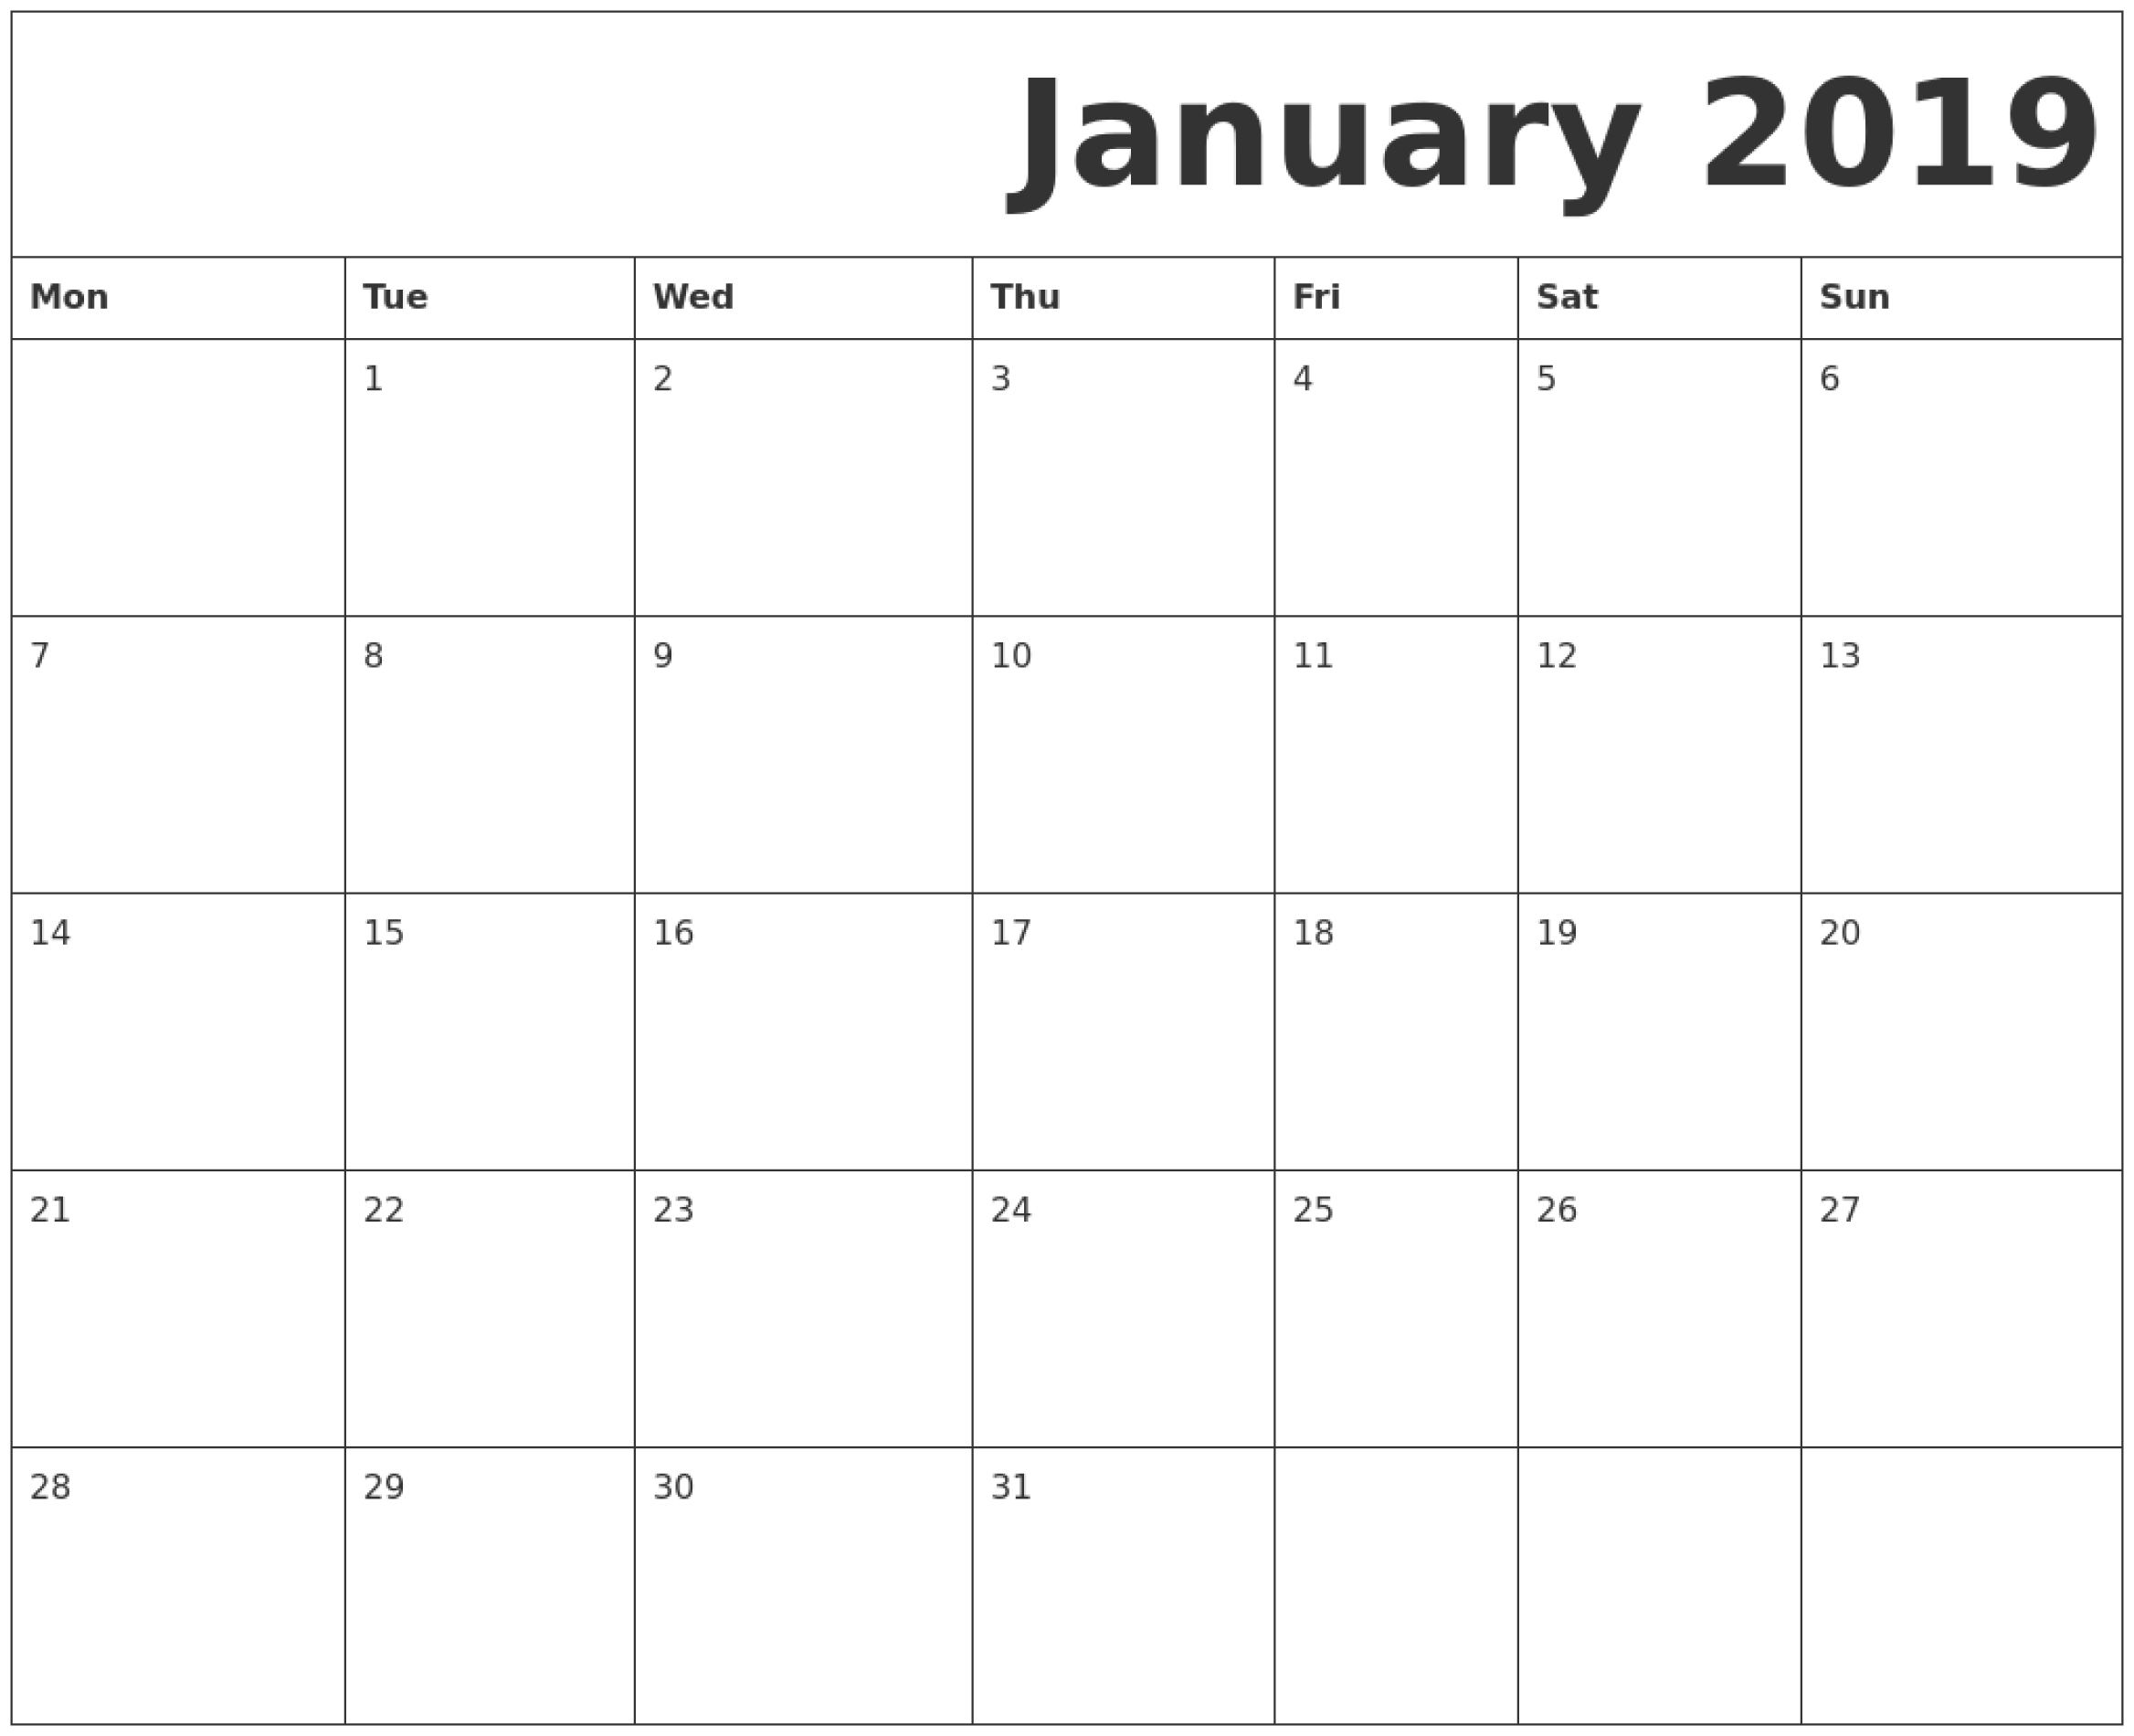 January 2019 Printable Calendar Monday Start. | June Perky Calender To Print With Monday Start Date